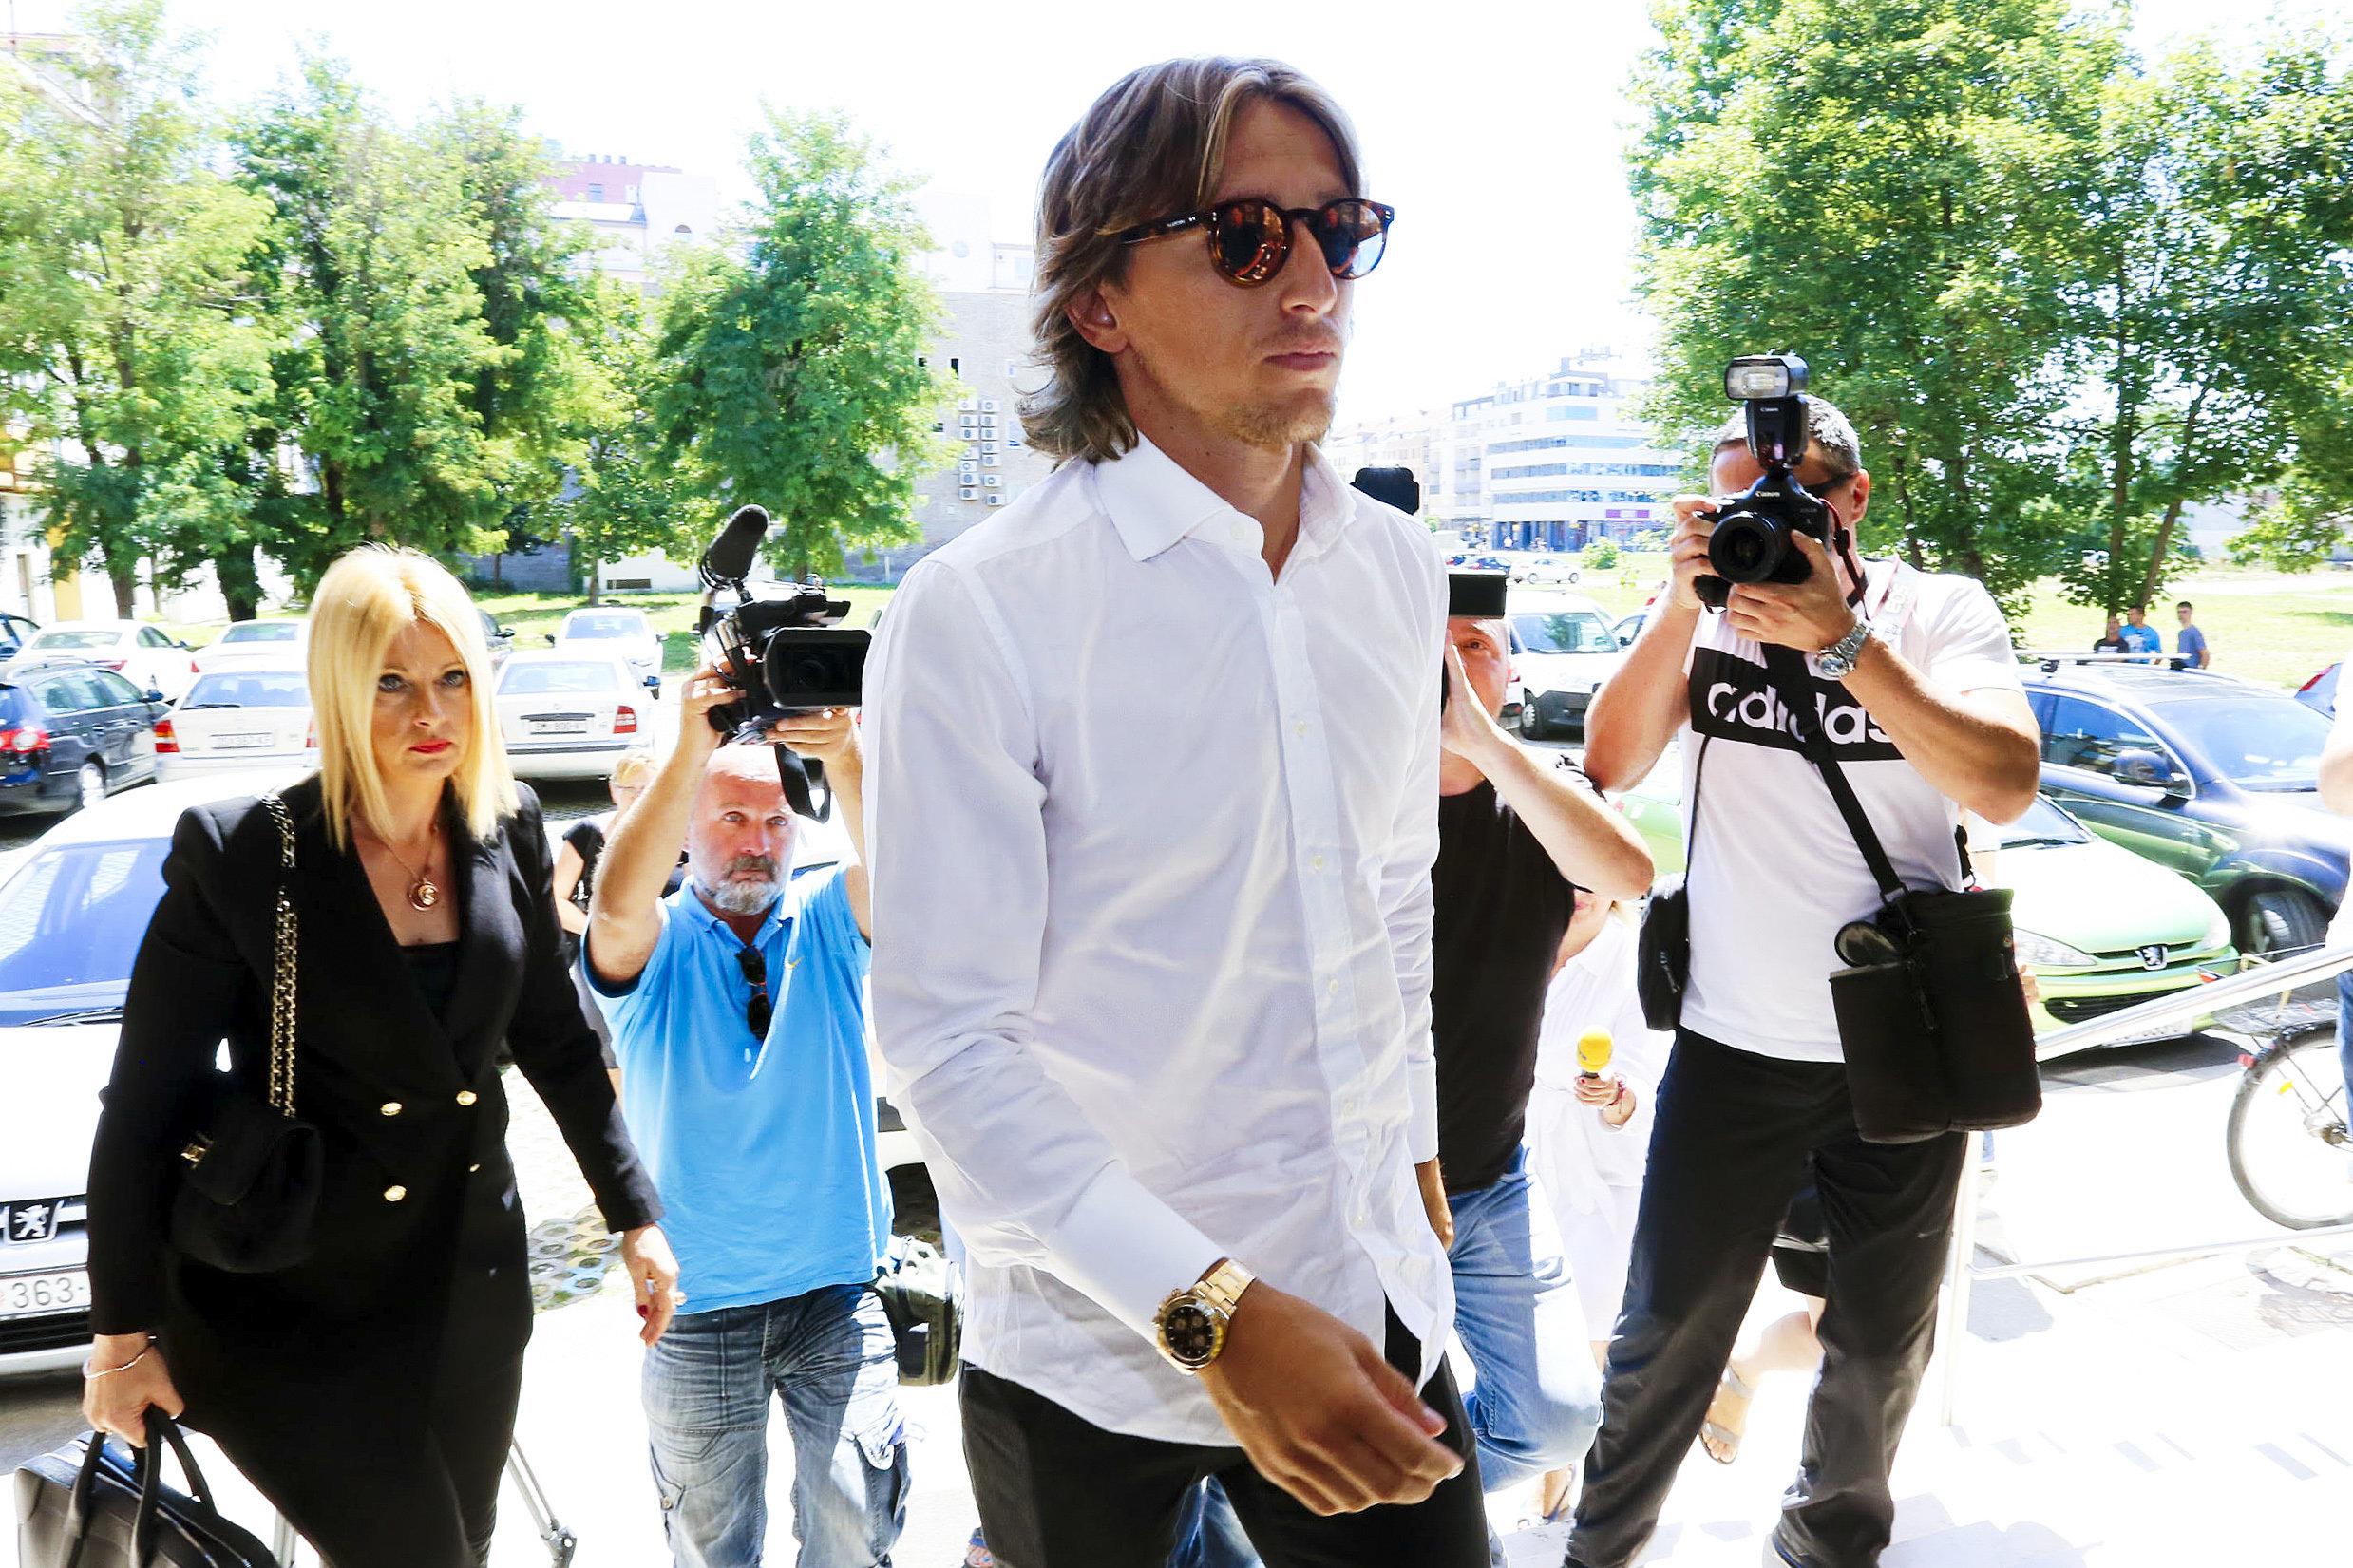 Kroatiens WM-Star: Warum viele kroatische Fans Luka Modric hassen